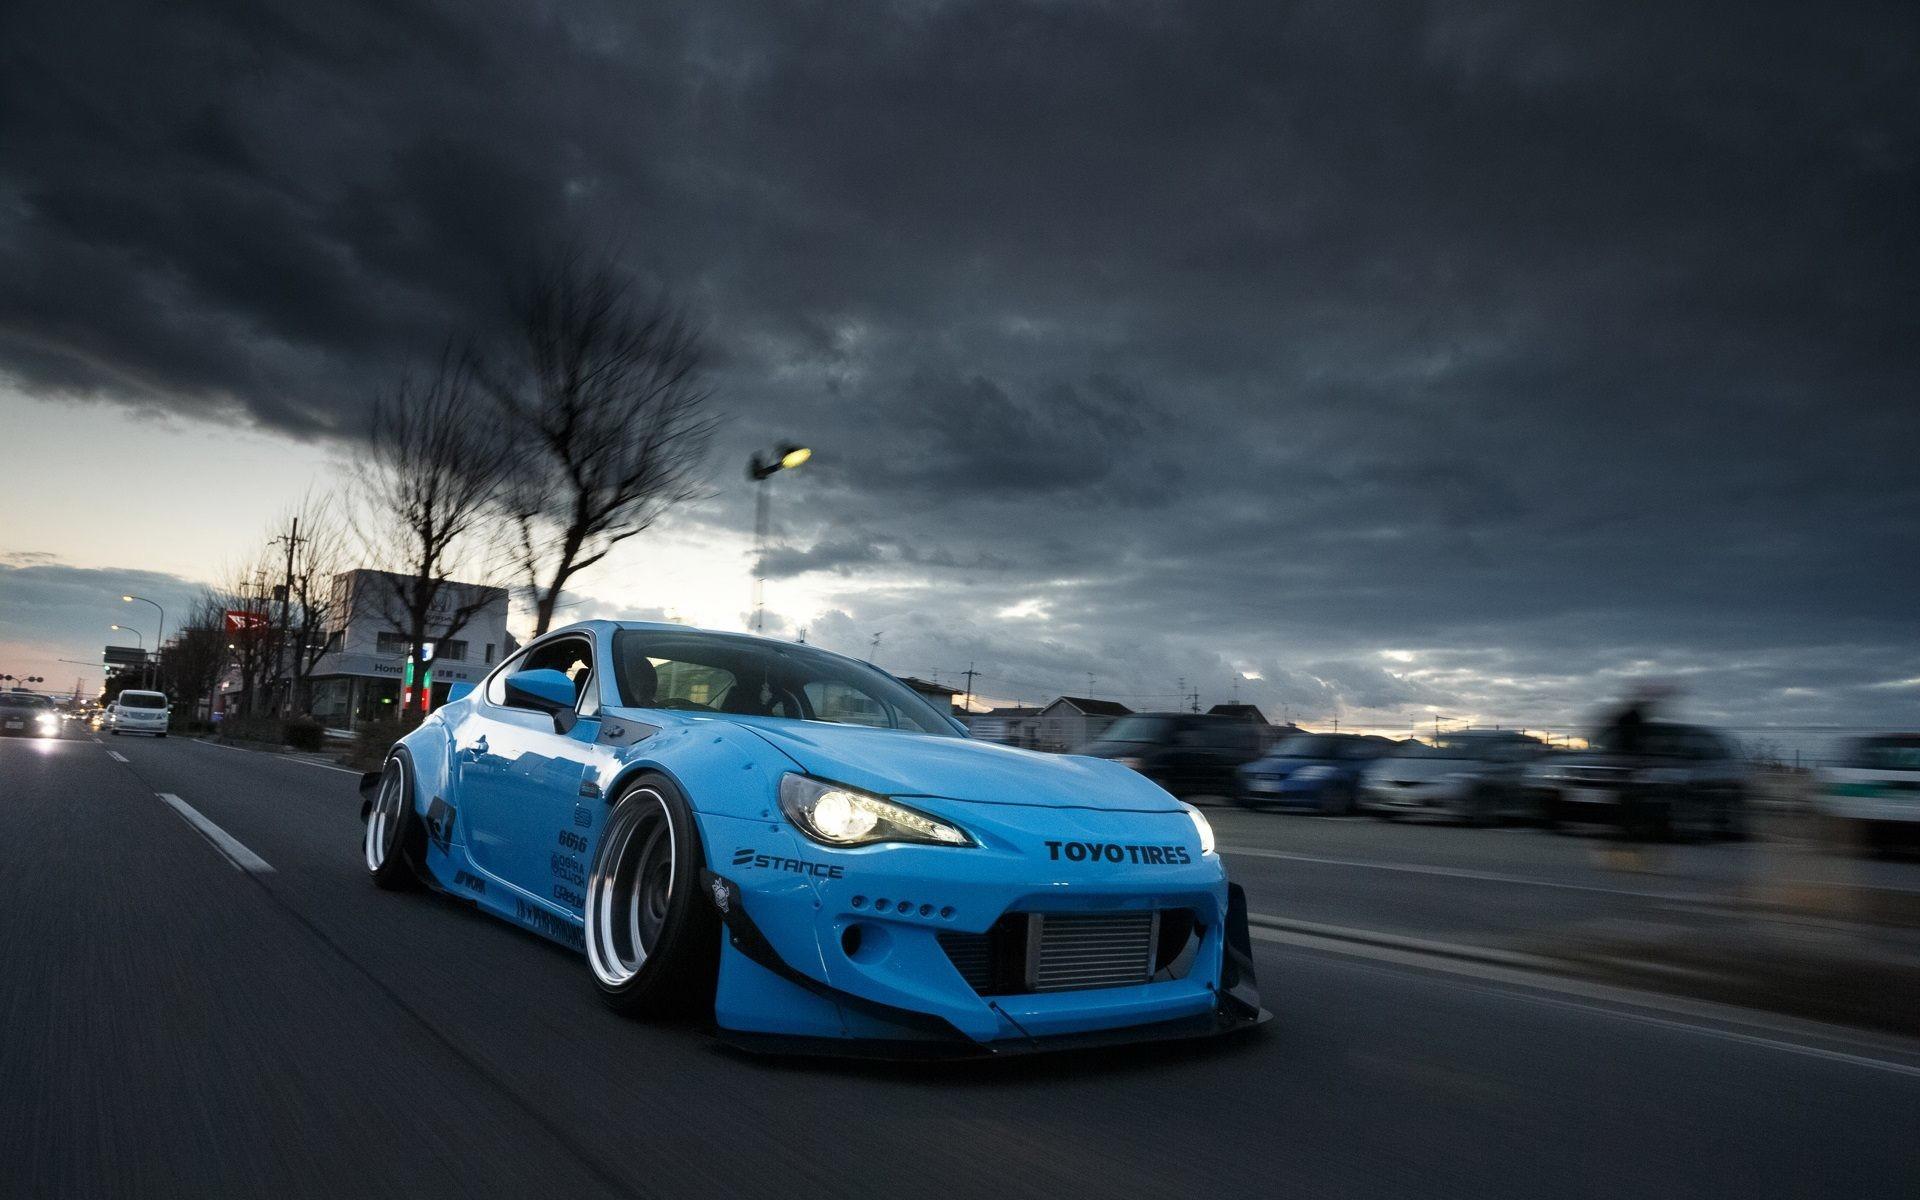 Blue Car Wallpaper 71 Images